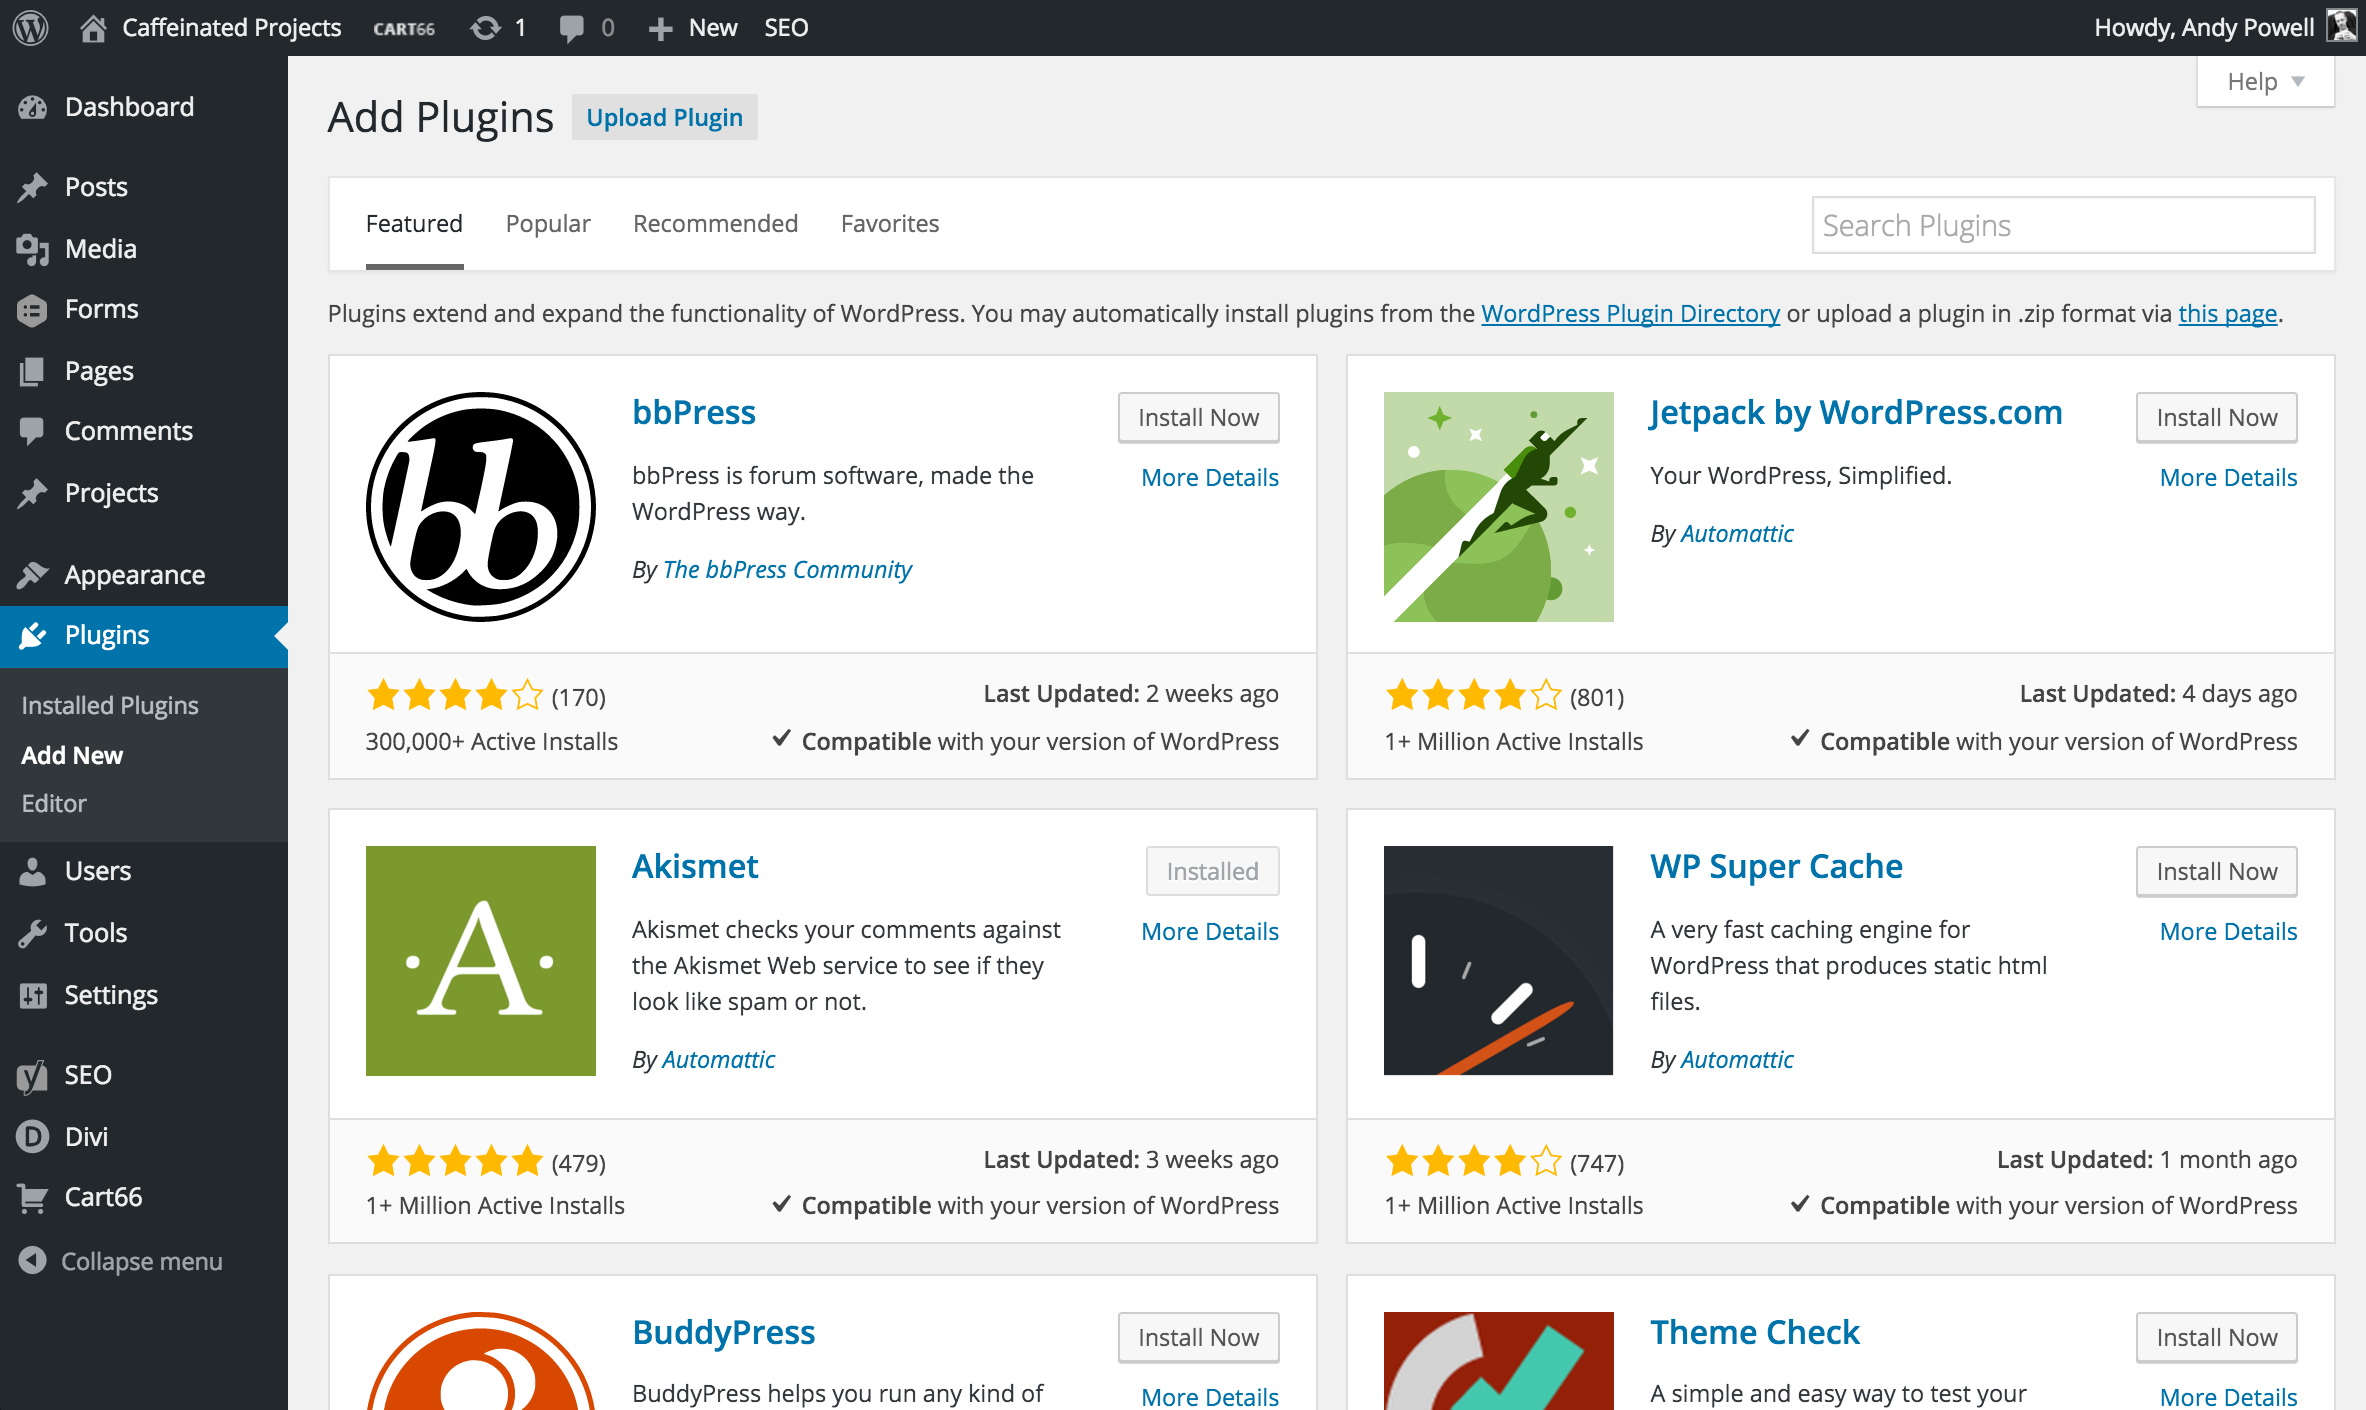 Putting a WordPress site in maintenance mode - Caffeinated P